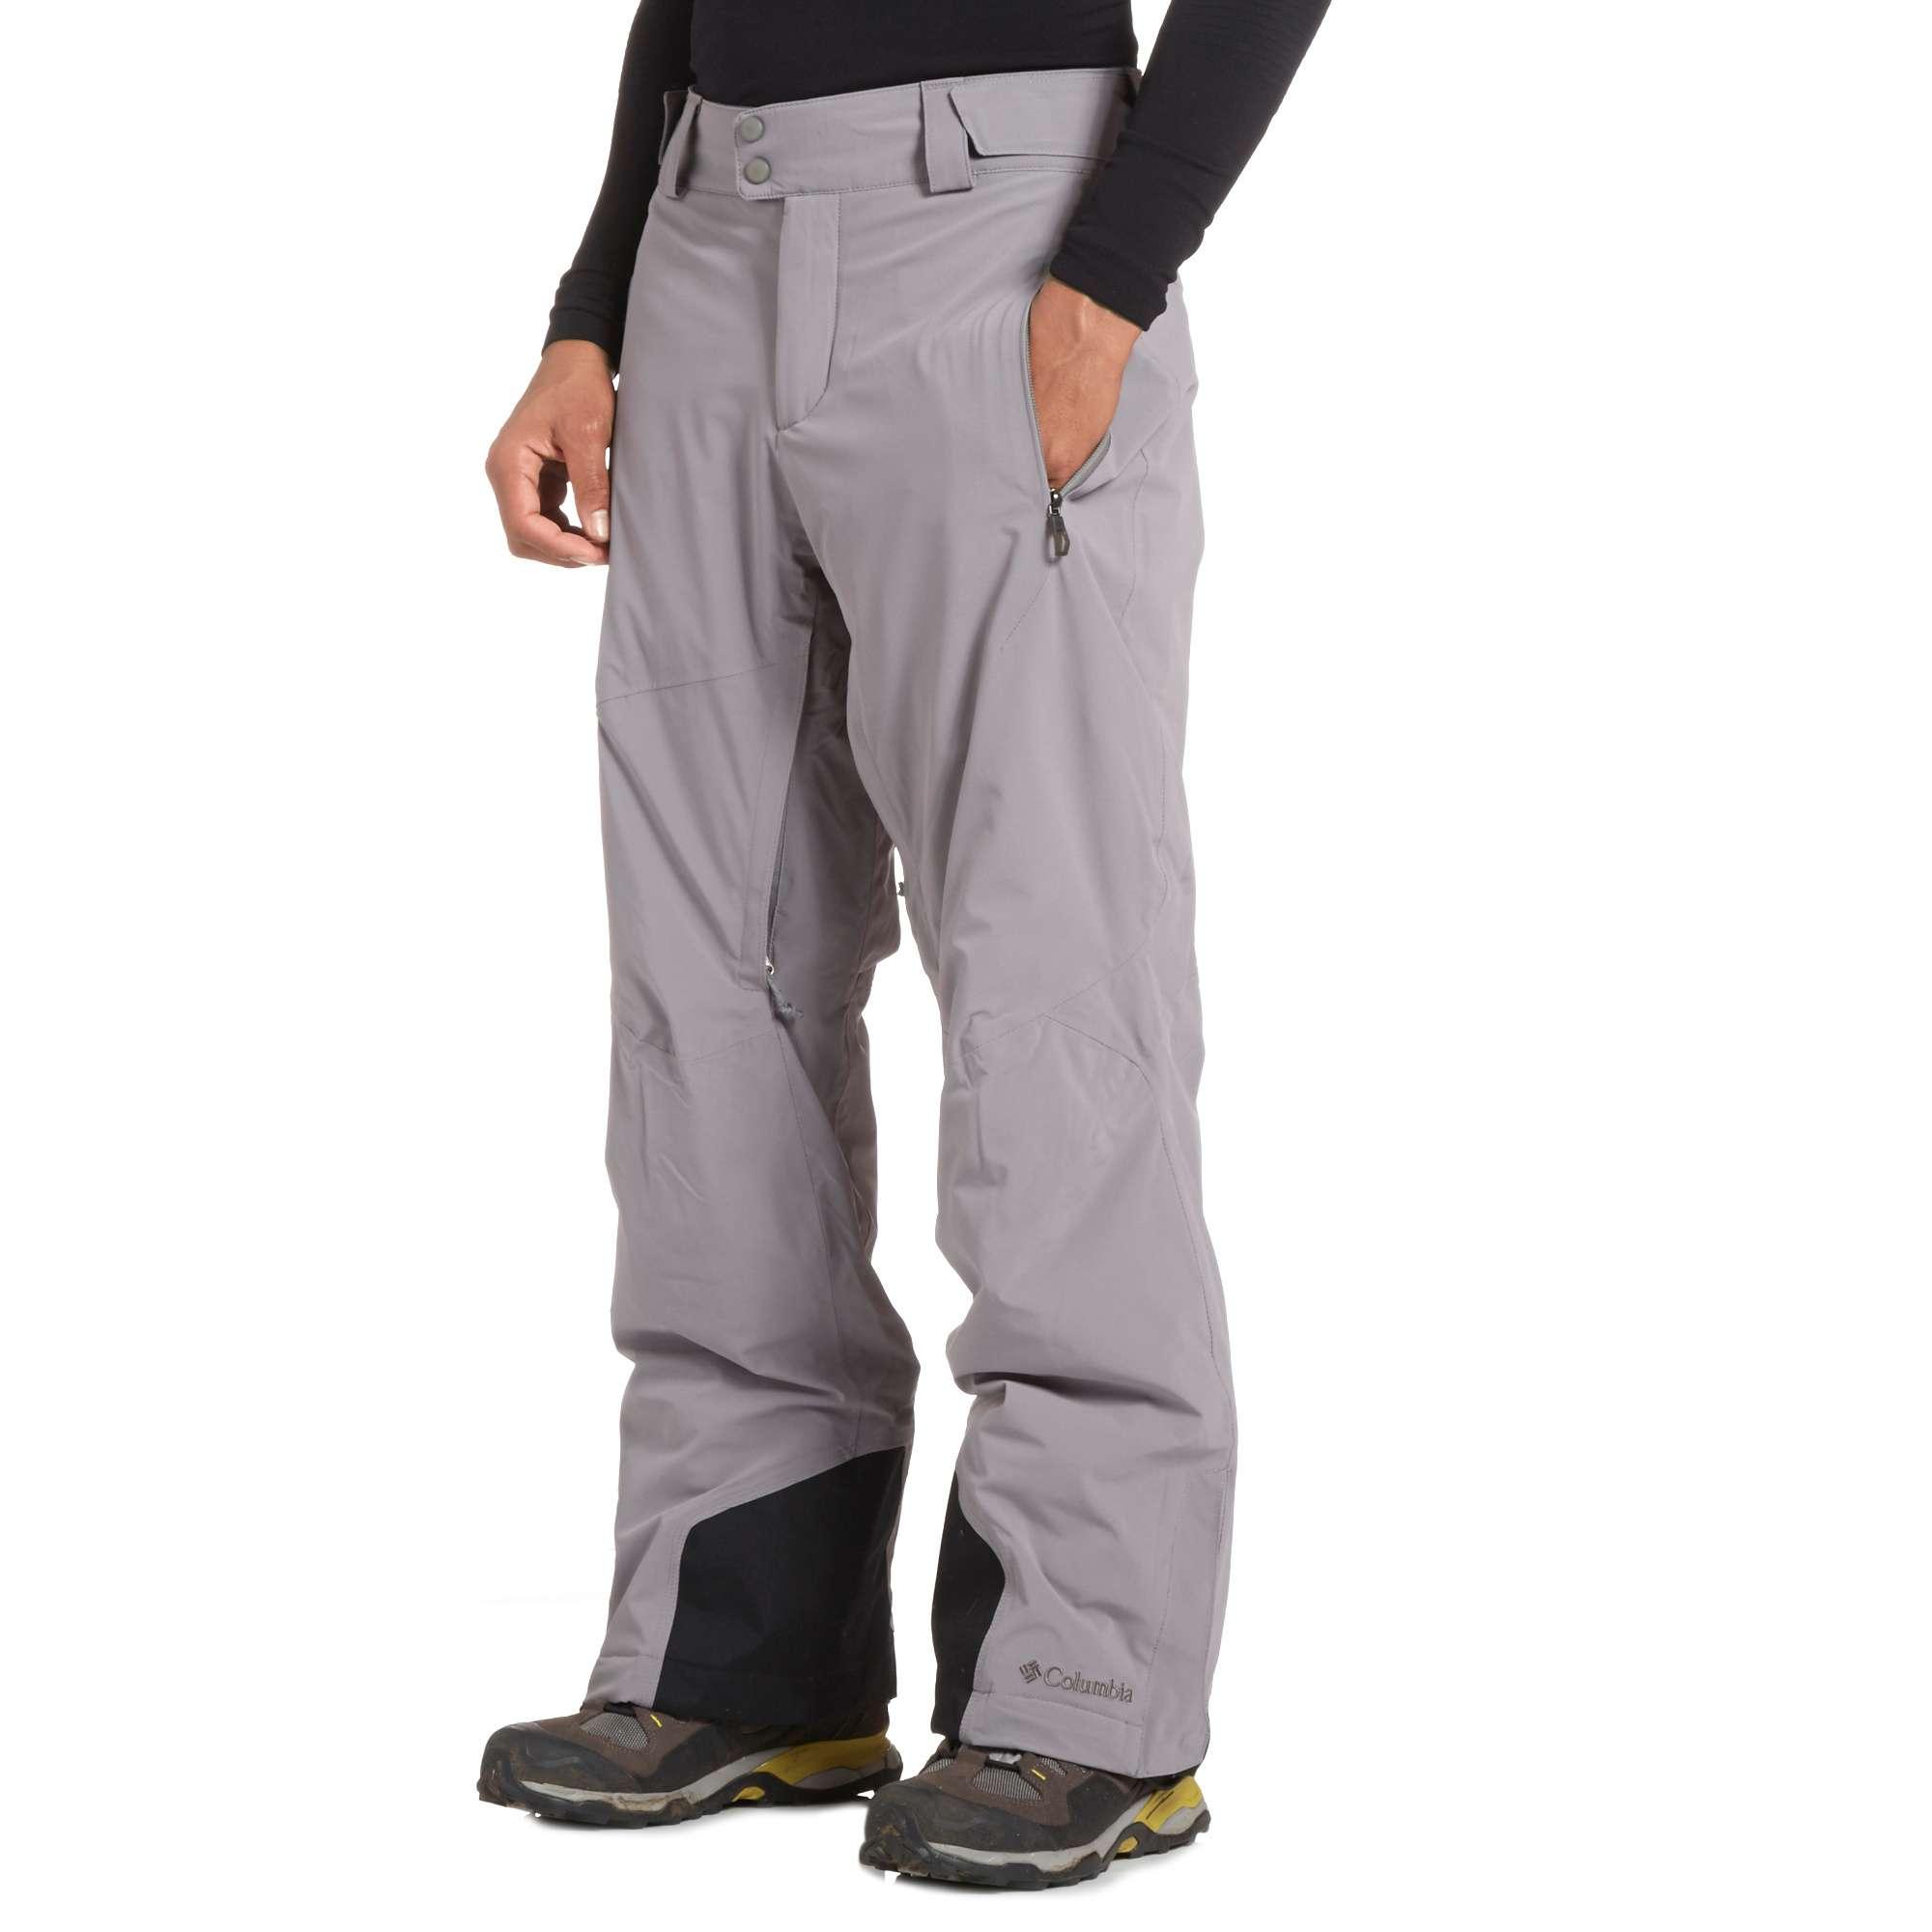 COLUMBIA Men's Millennium Blur Ski Pants